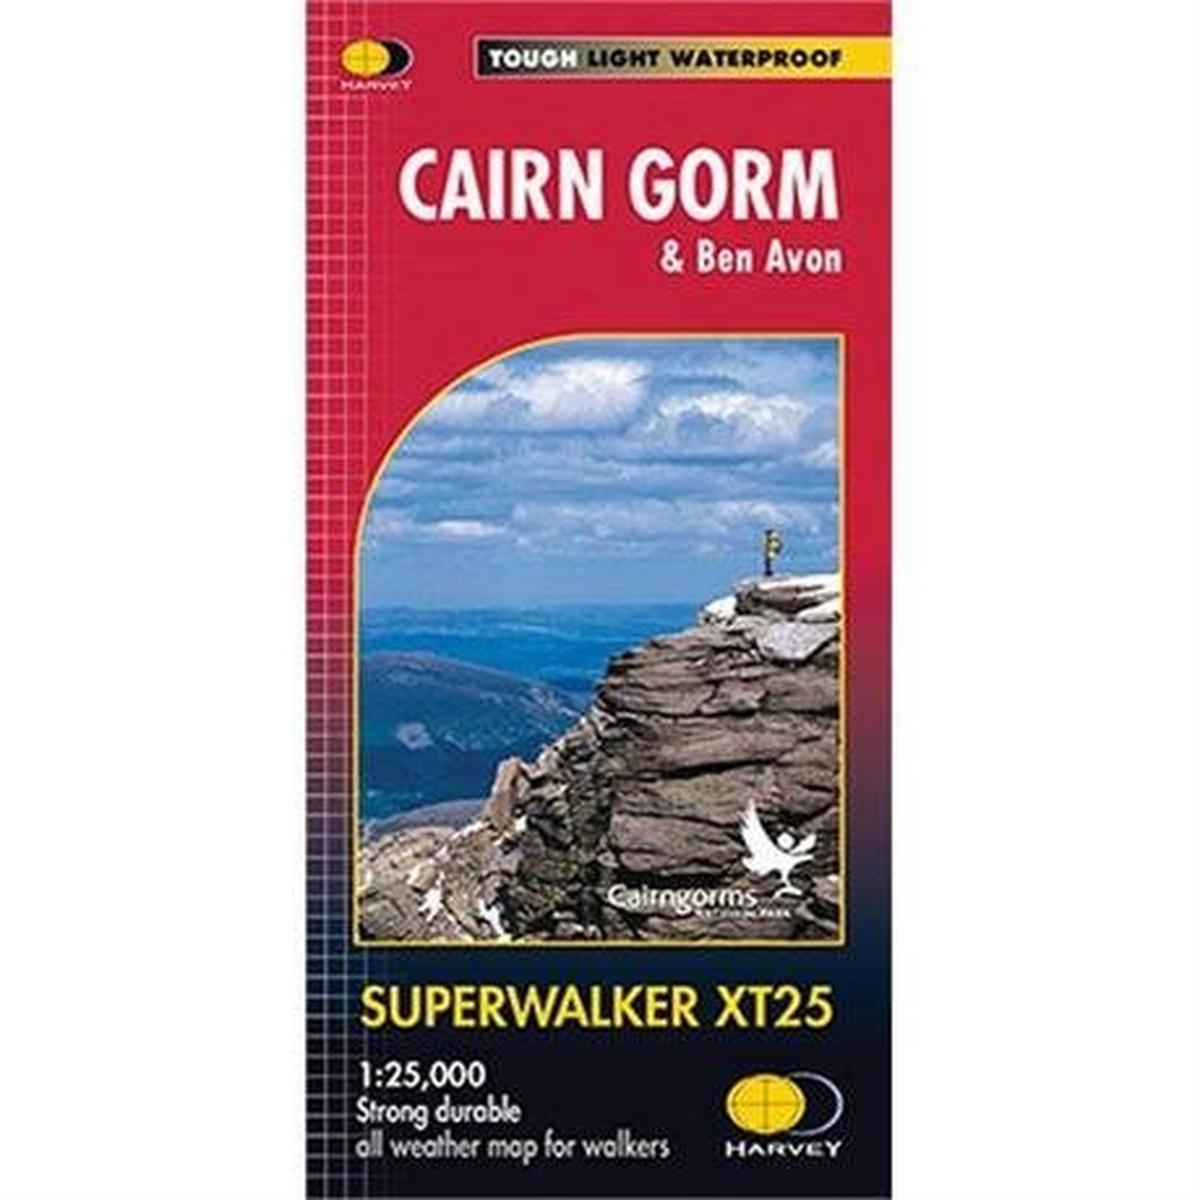 Harveys Harvey Map - Superwalker XT25: Cairn Gorm